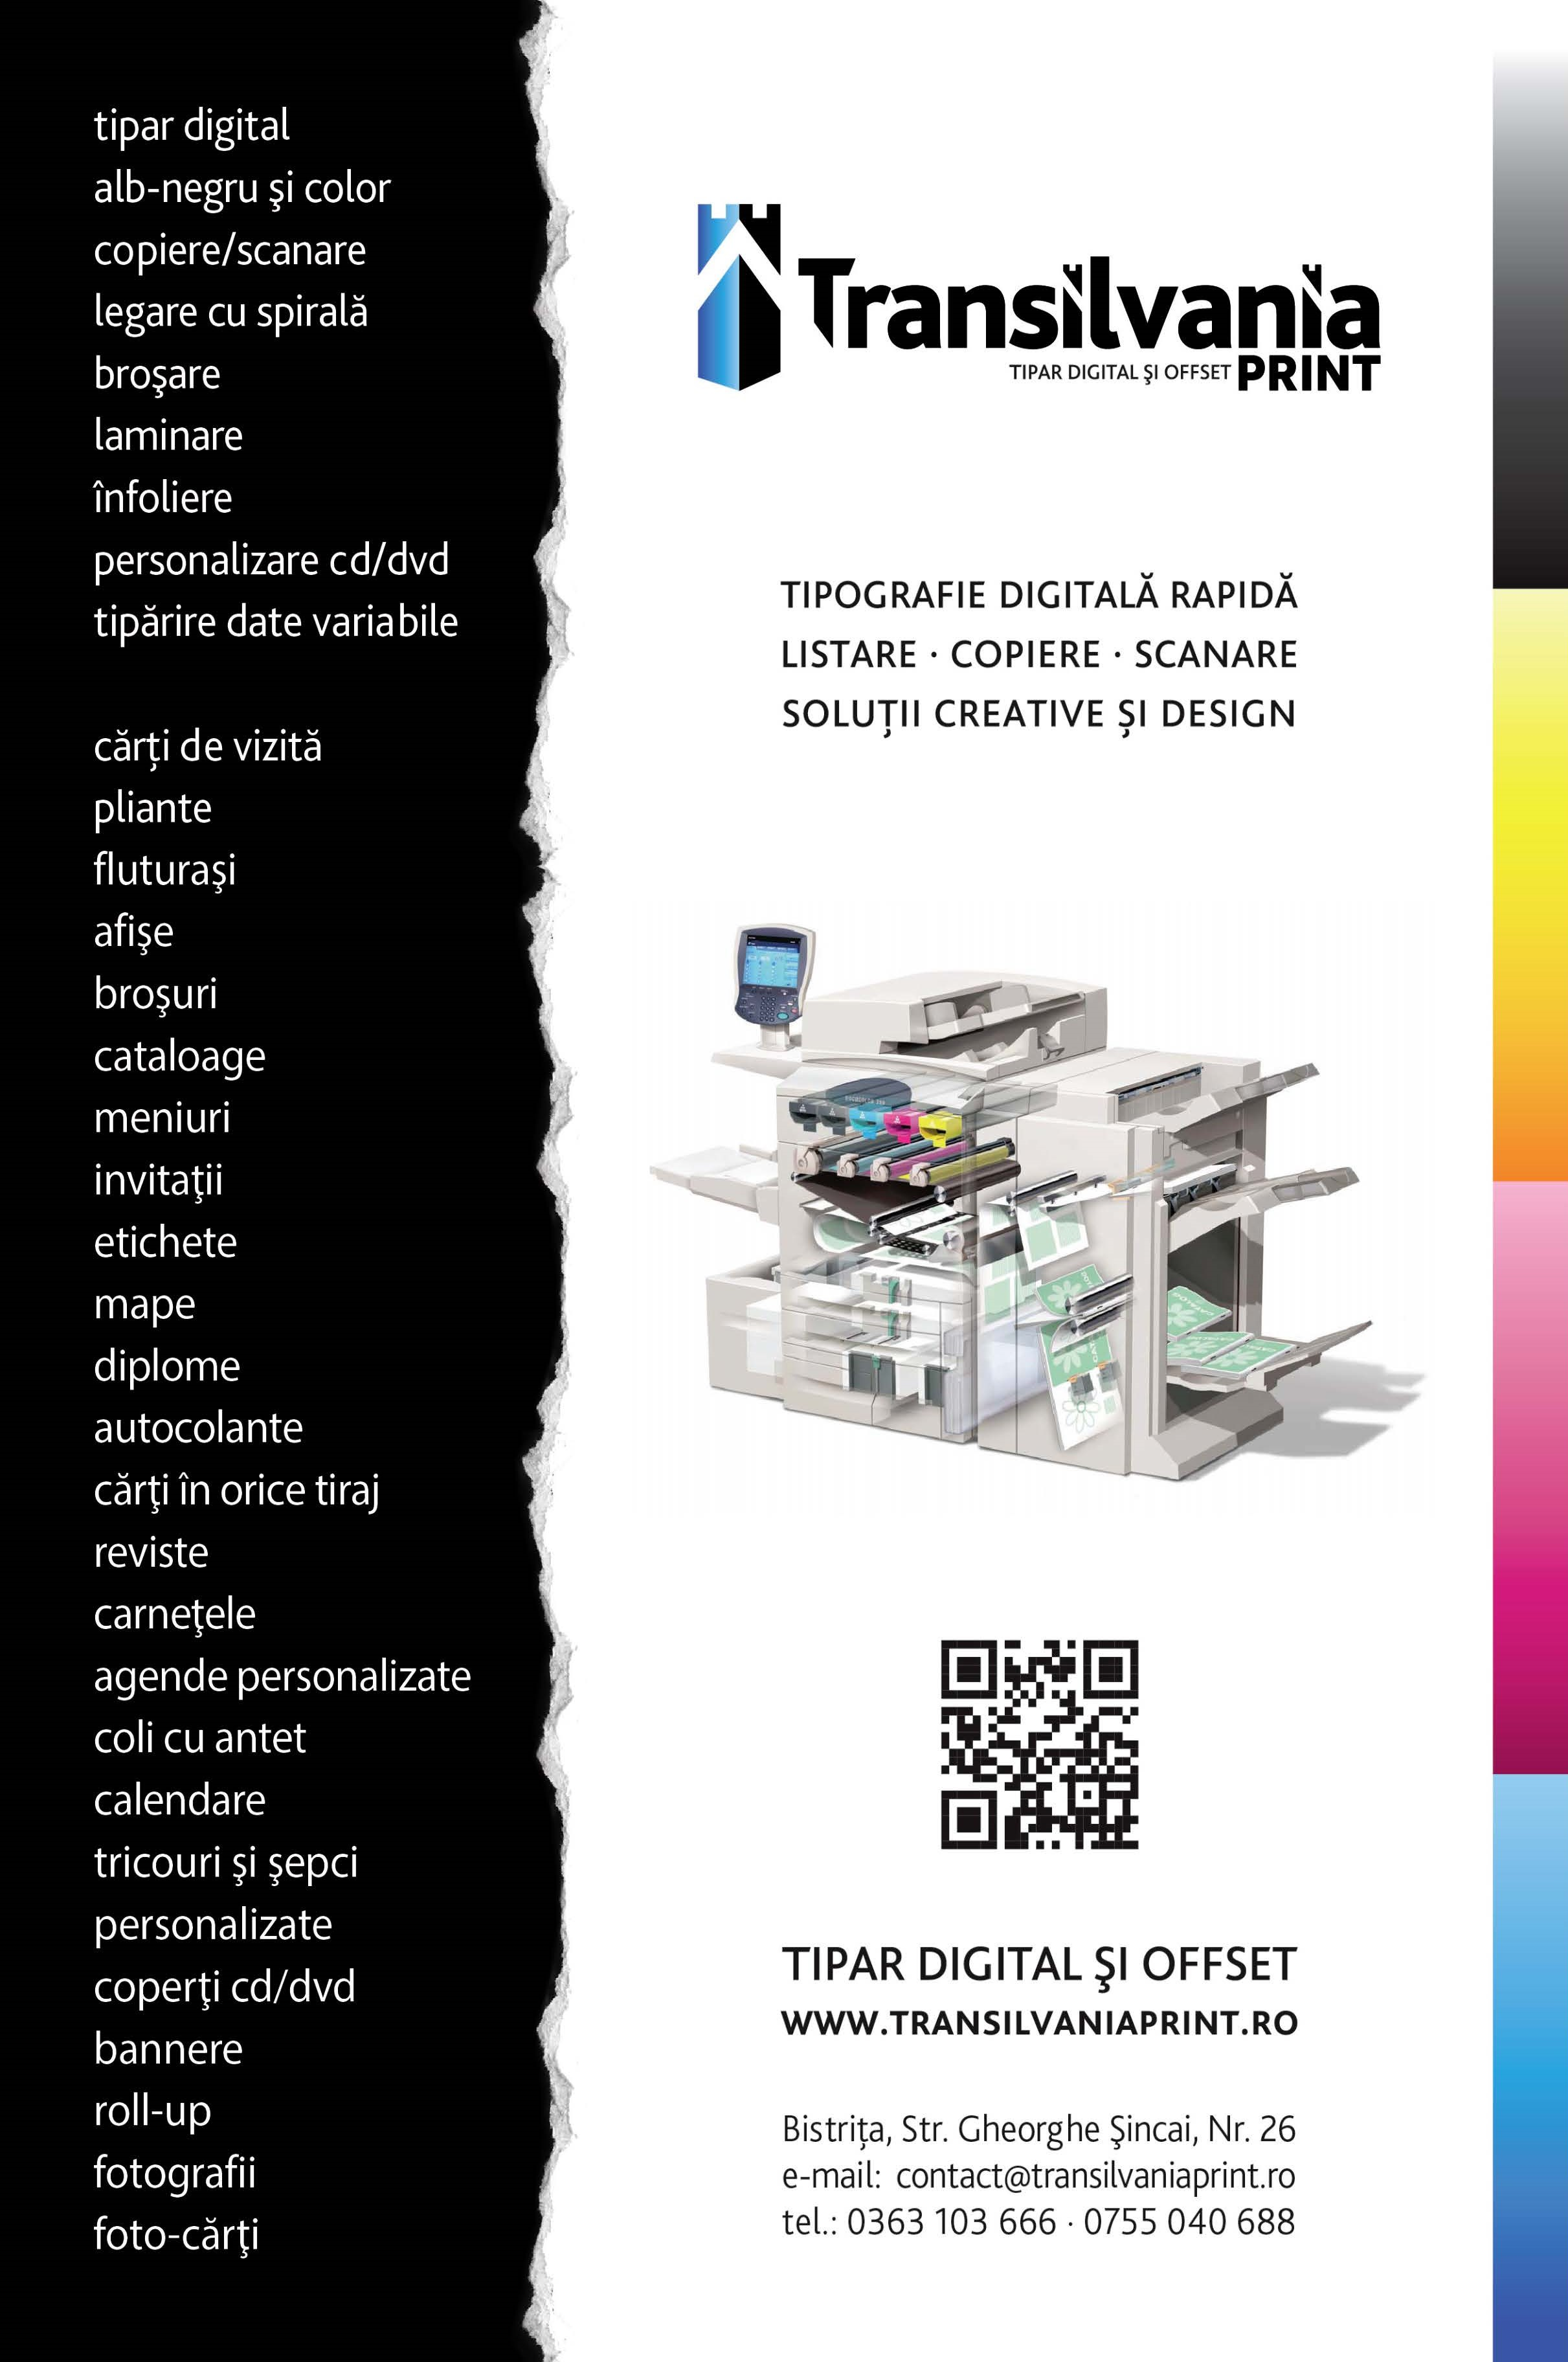 transilvania-print